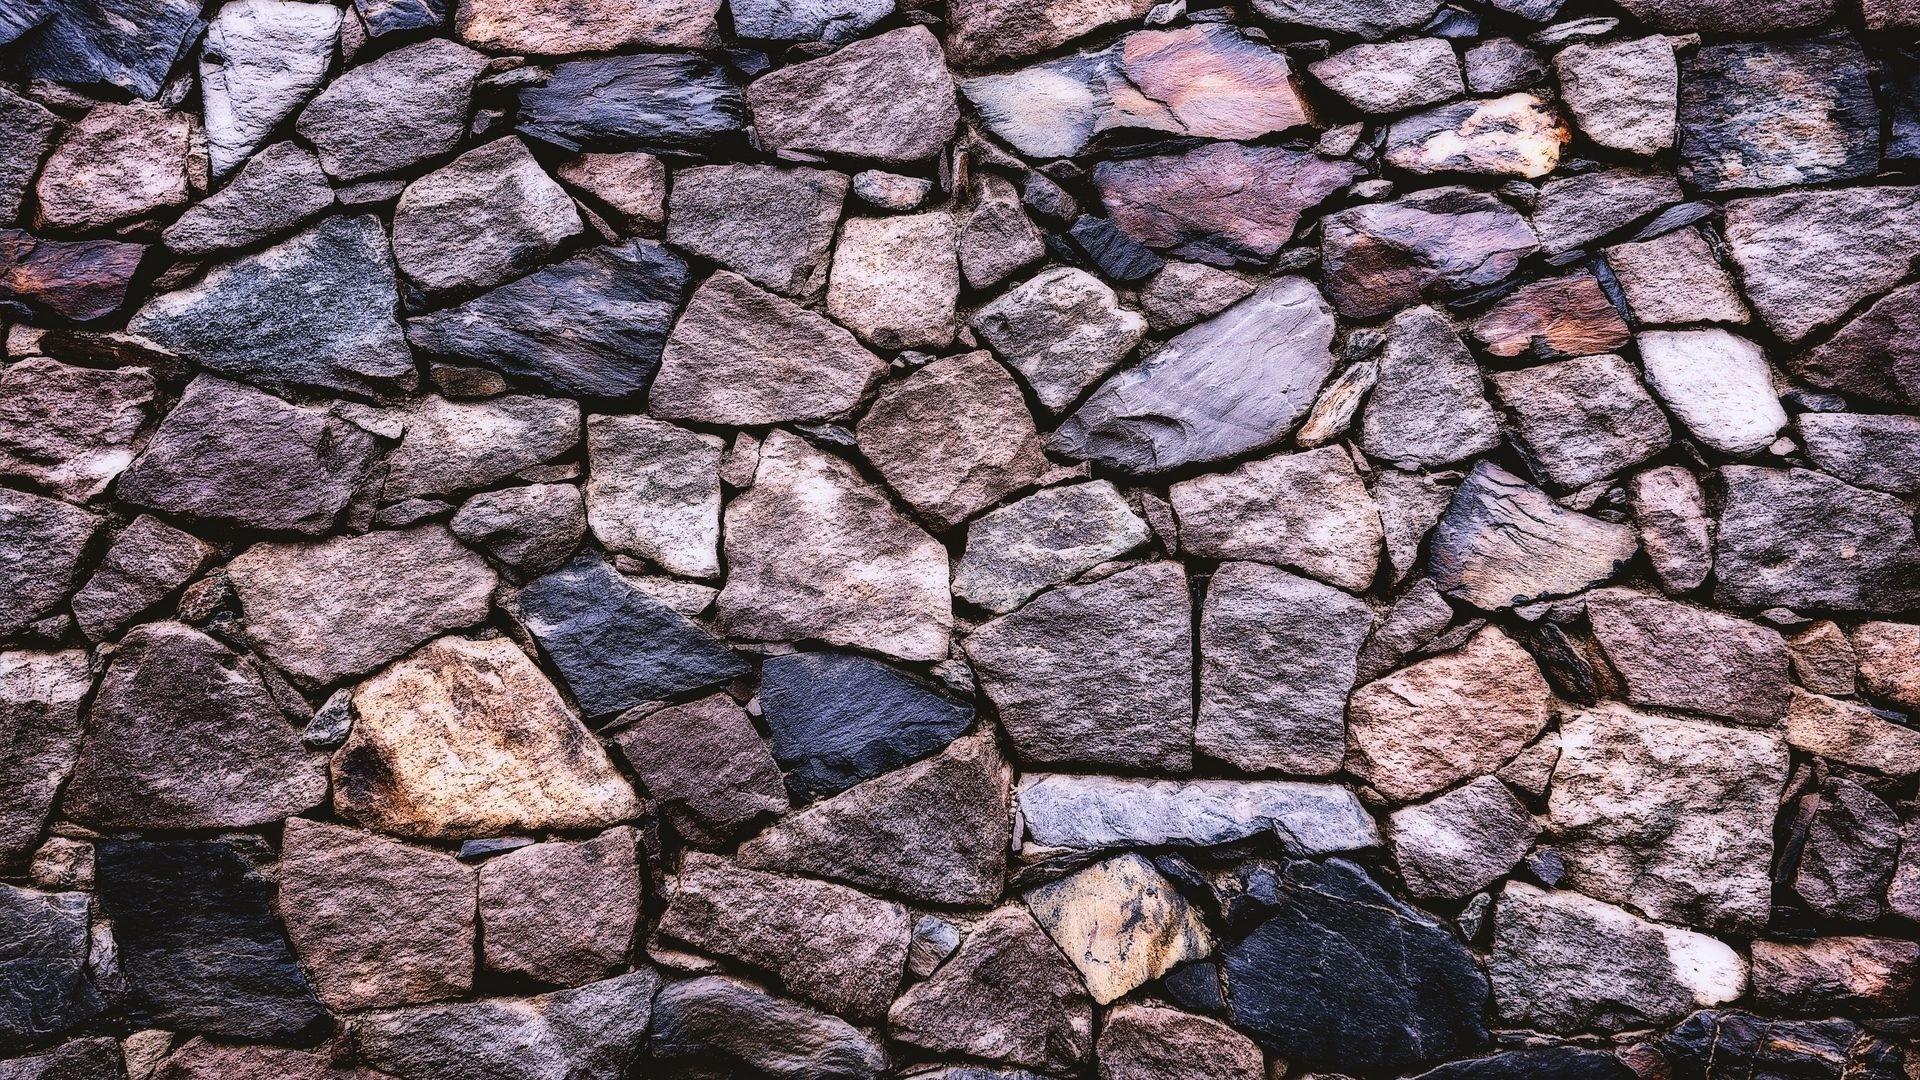 Texture Stone wallpaper for desktop